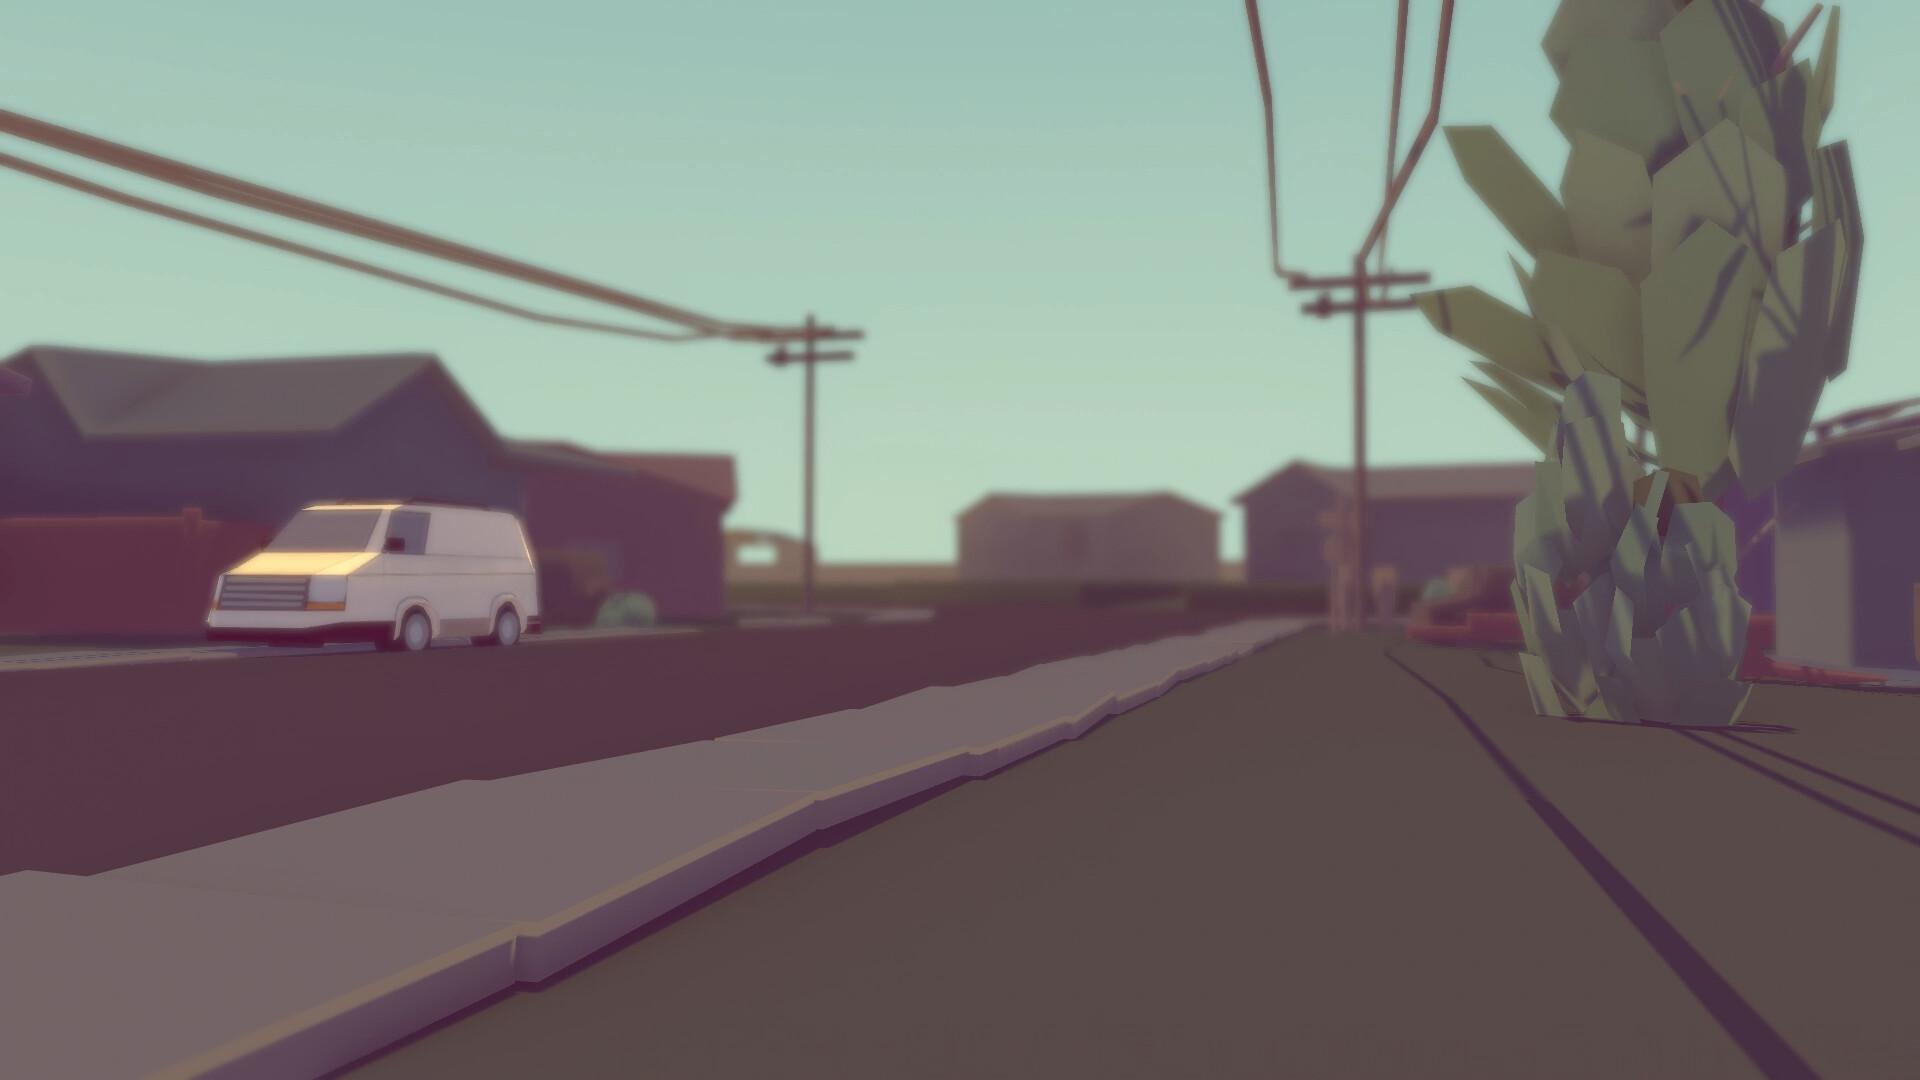 Steven harmon screenshot 03